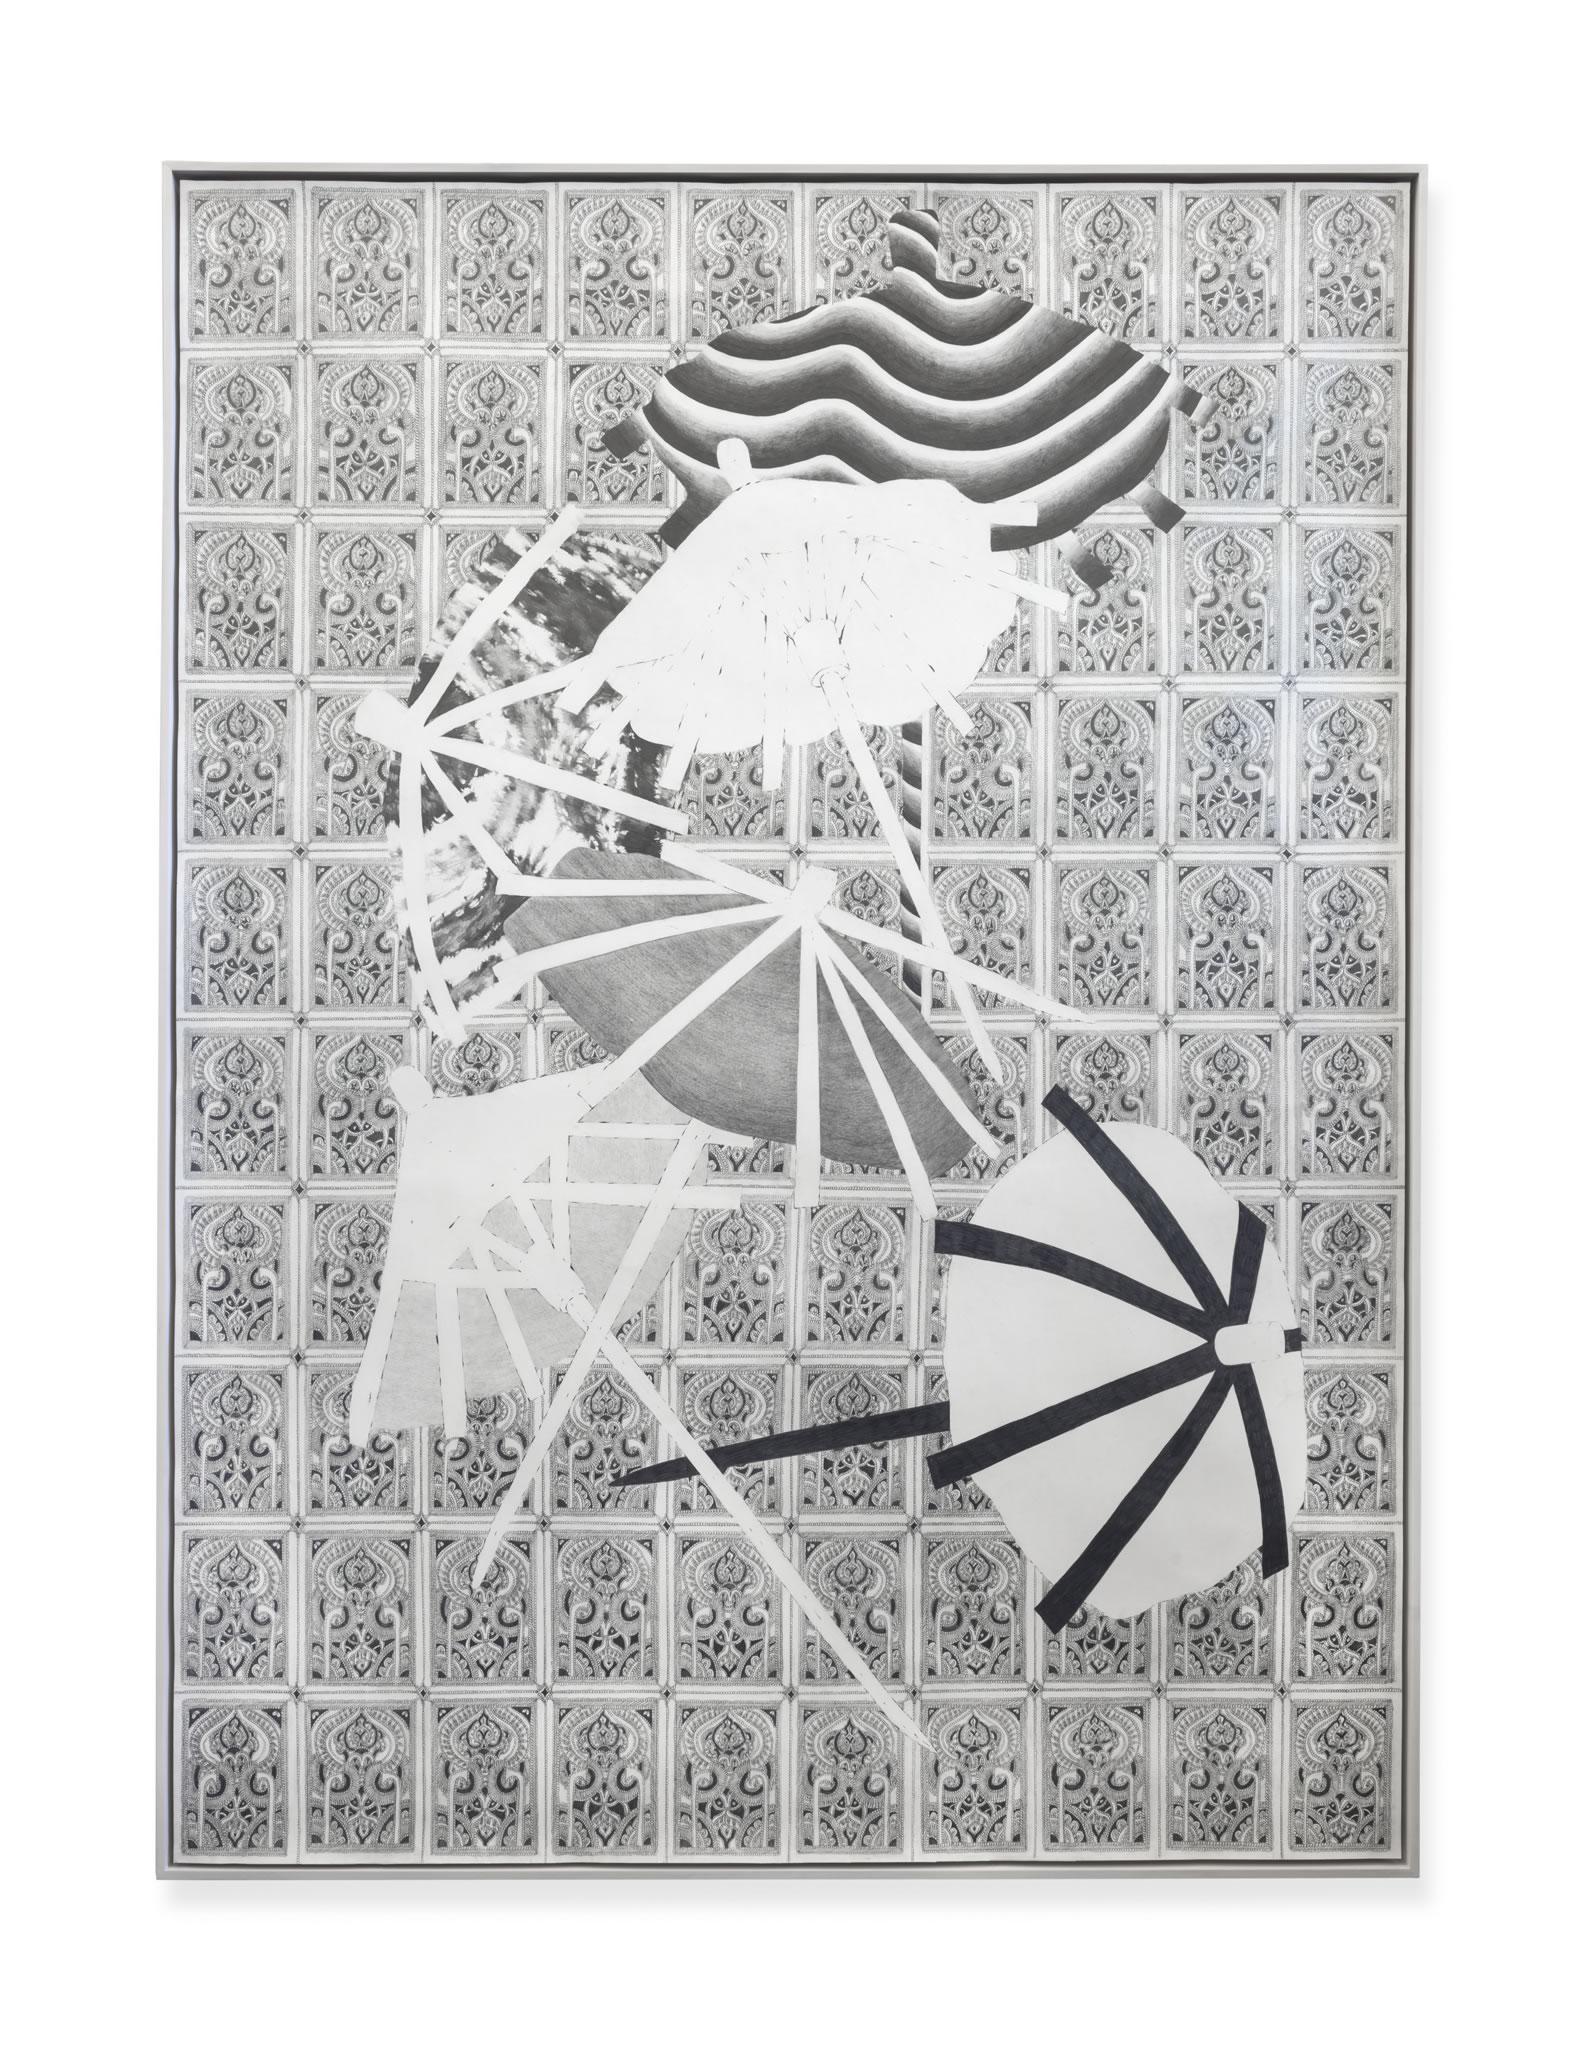 Galerie3 | Patrick Roman Scherer | o.T. | 2018 | 250 x 200 cm | Foto: Bastian Schwind